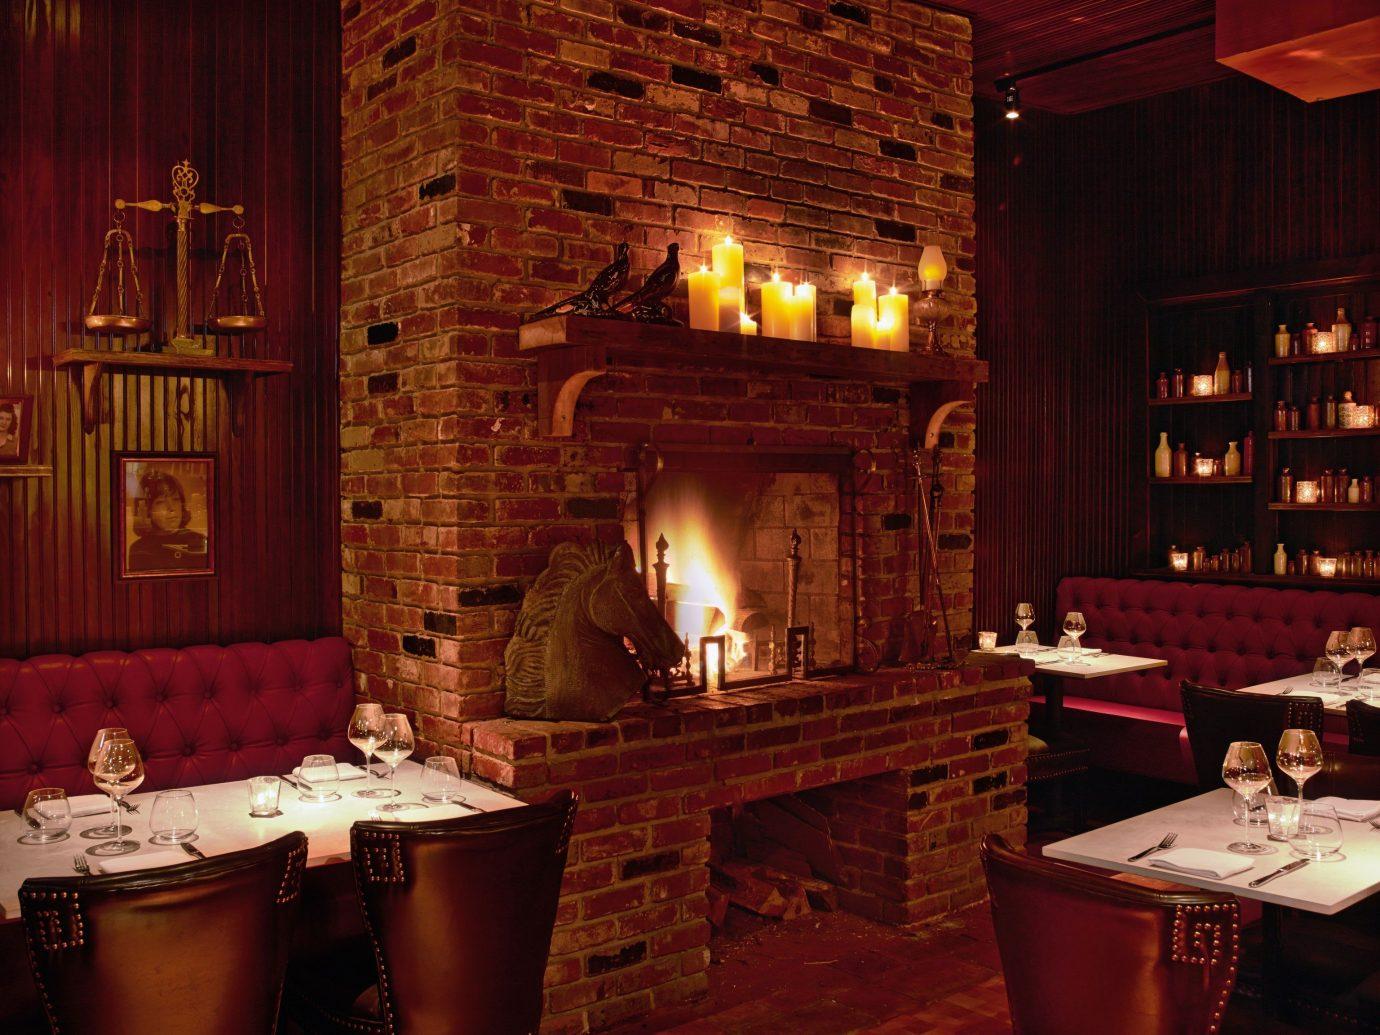 Food + Drink indoor room restaurant lighting interior design Bar estate Fireplace decorated